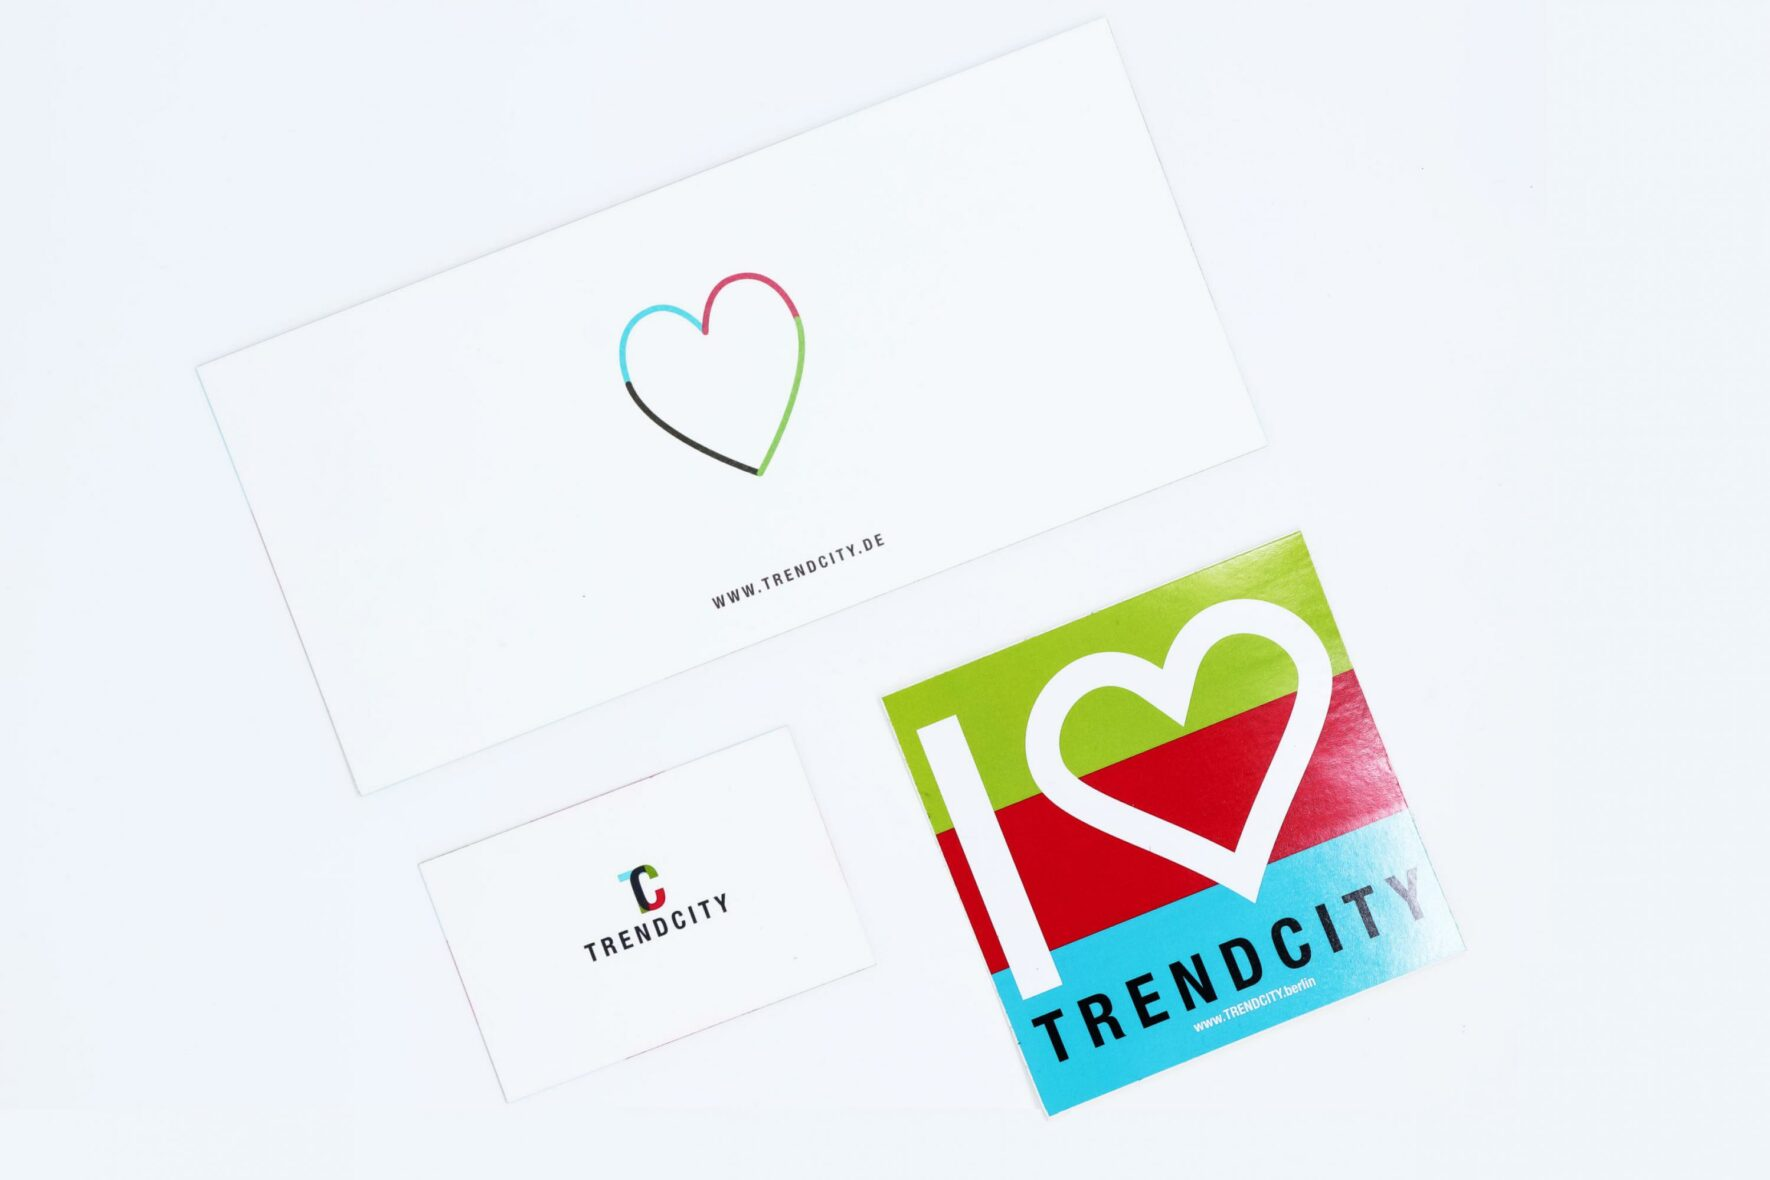 trendcity-sticker-formlos-berlin-gestaltung-design